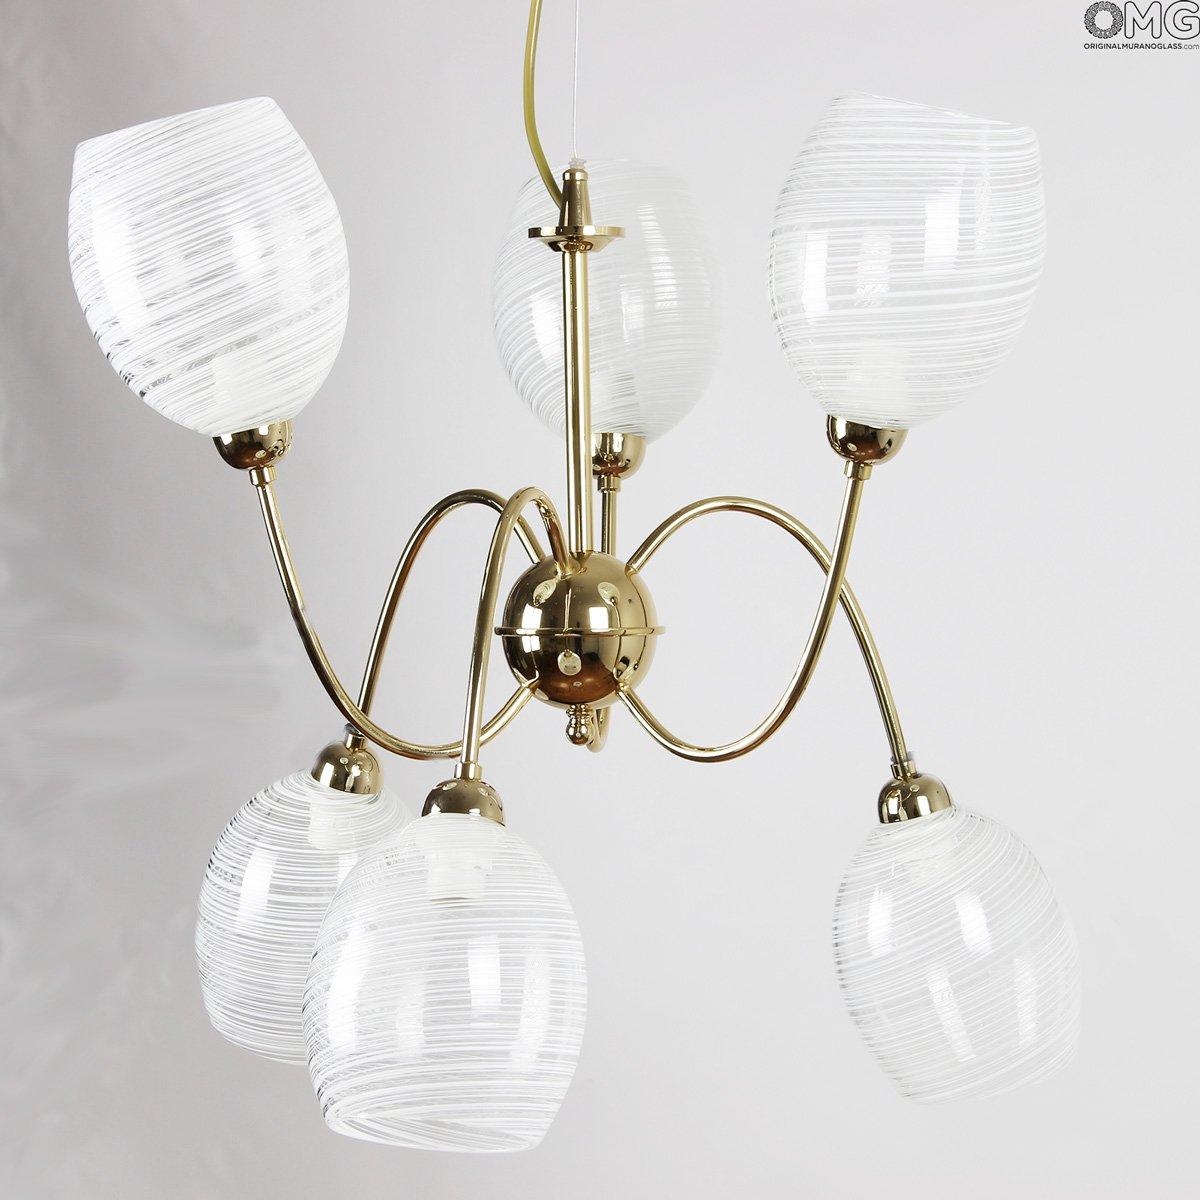 Fantasia Bianca - Lampada 6 luci  - Vetro di Murano originale